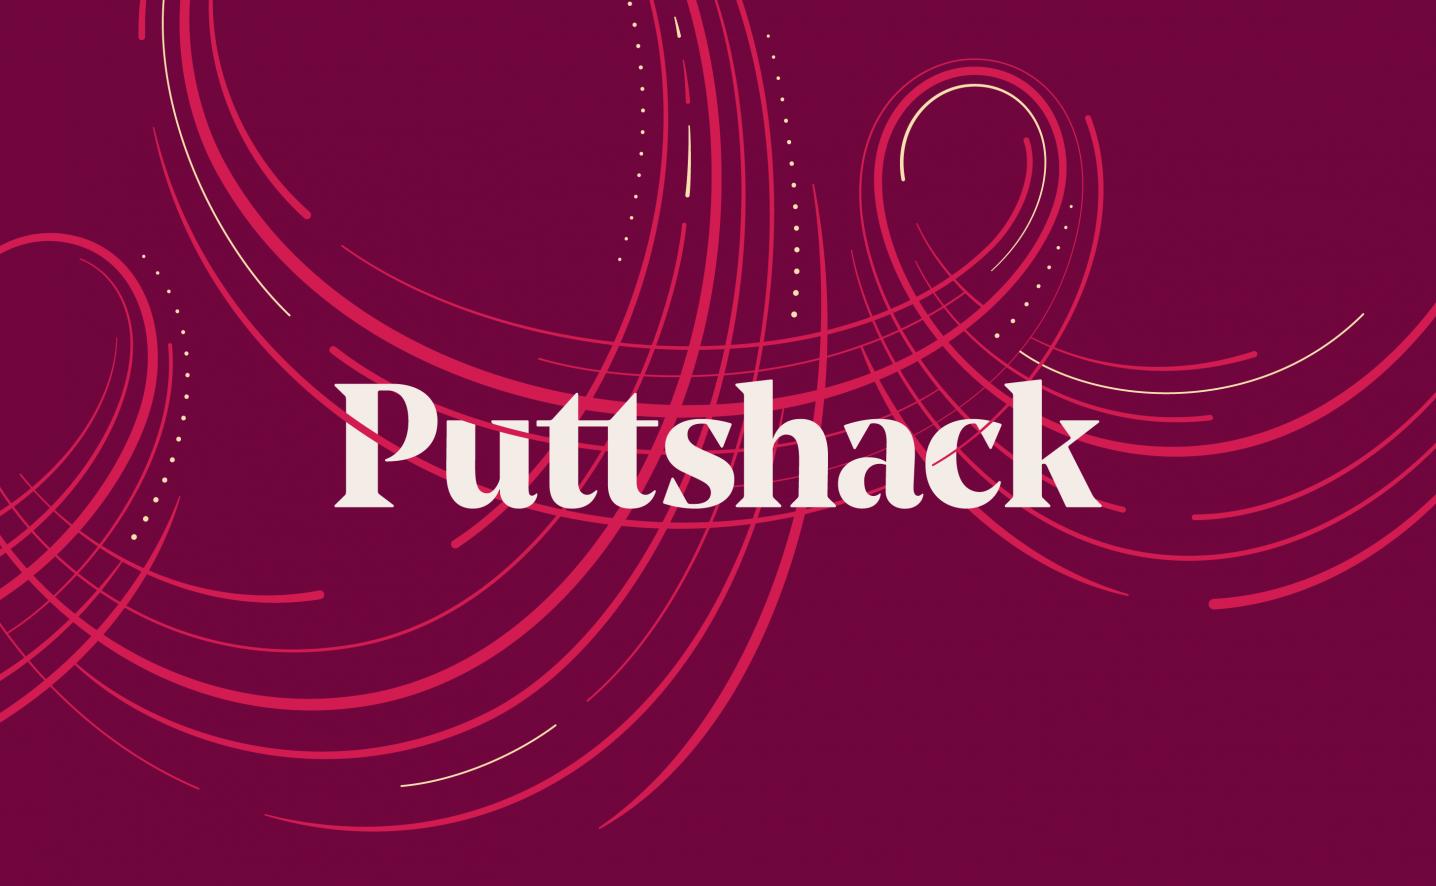 Puttshack logo